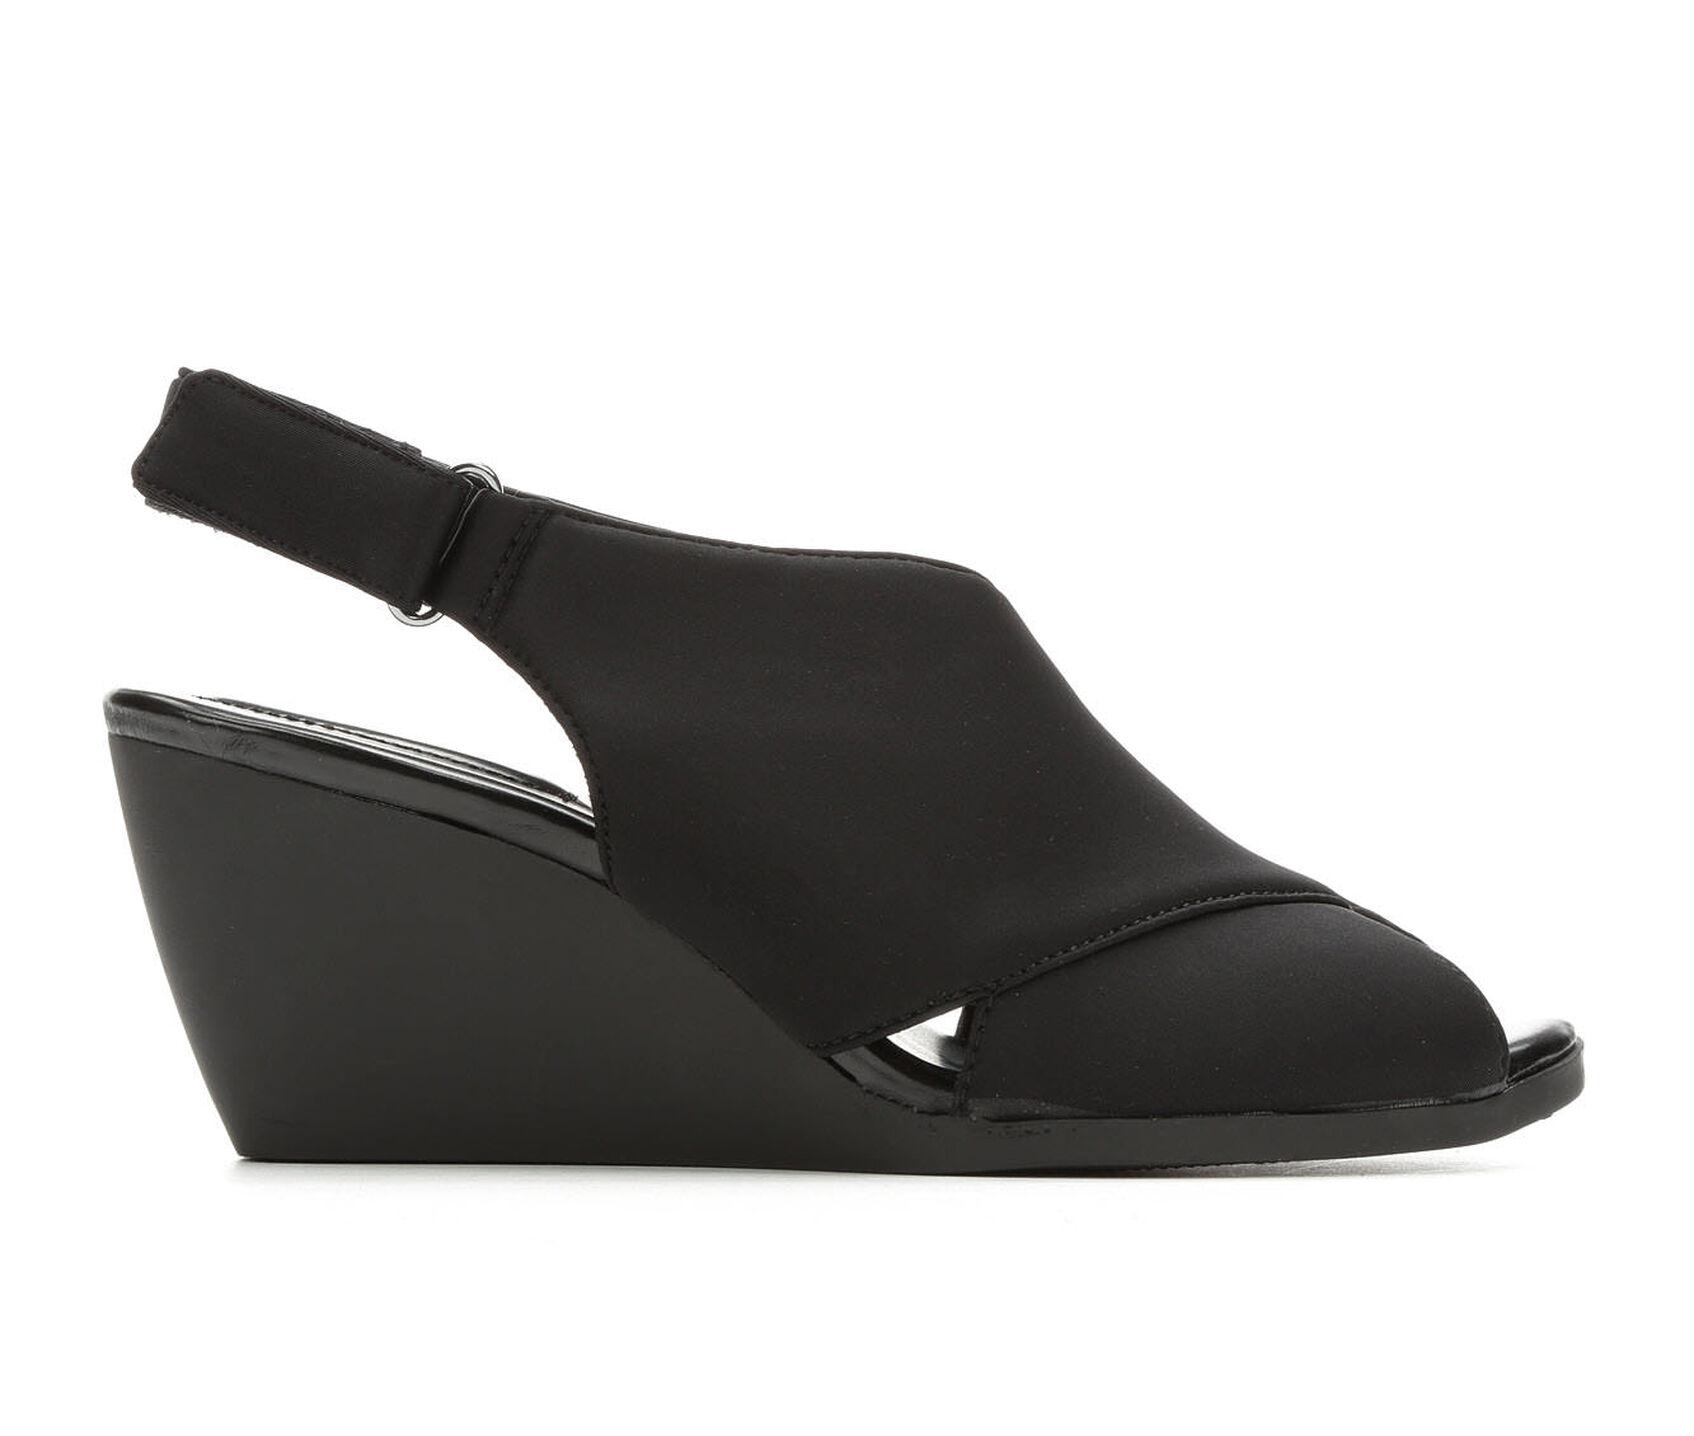 a6d89a0ad0eb ... Bandolino Afton Wedge Sandals. Previous